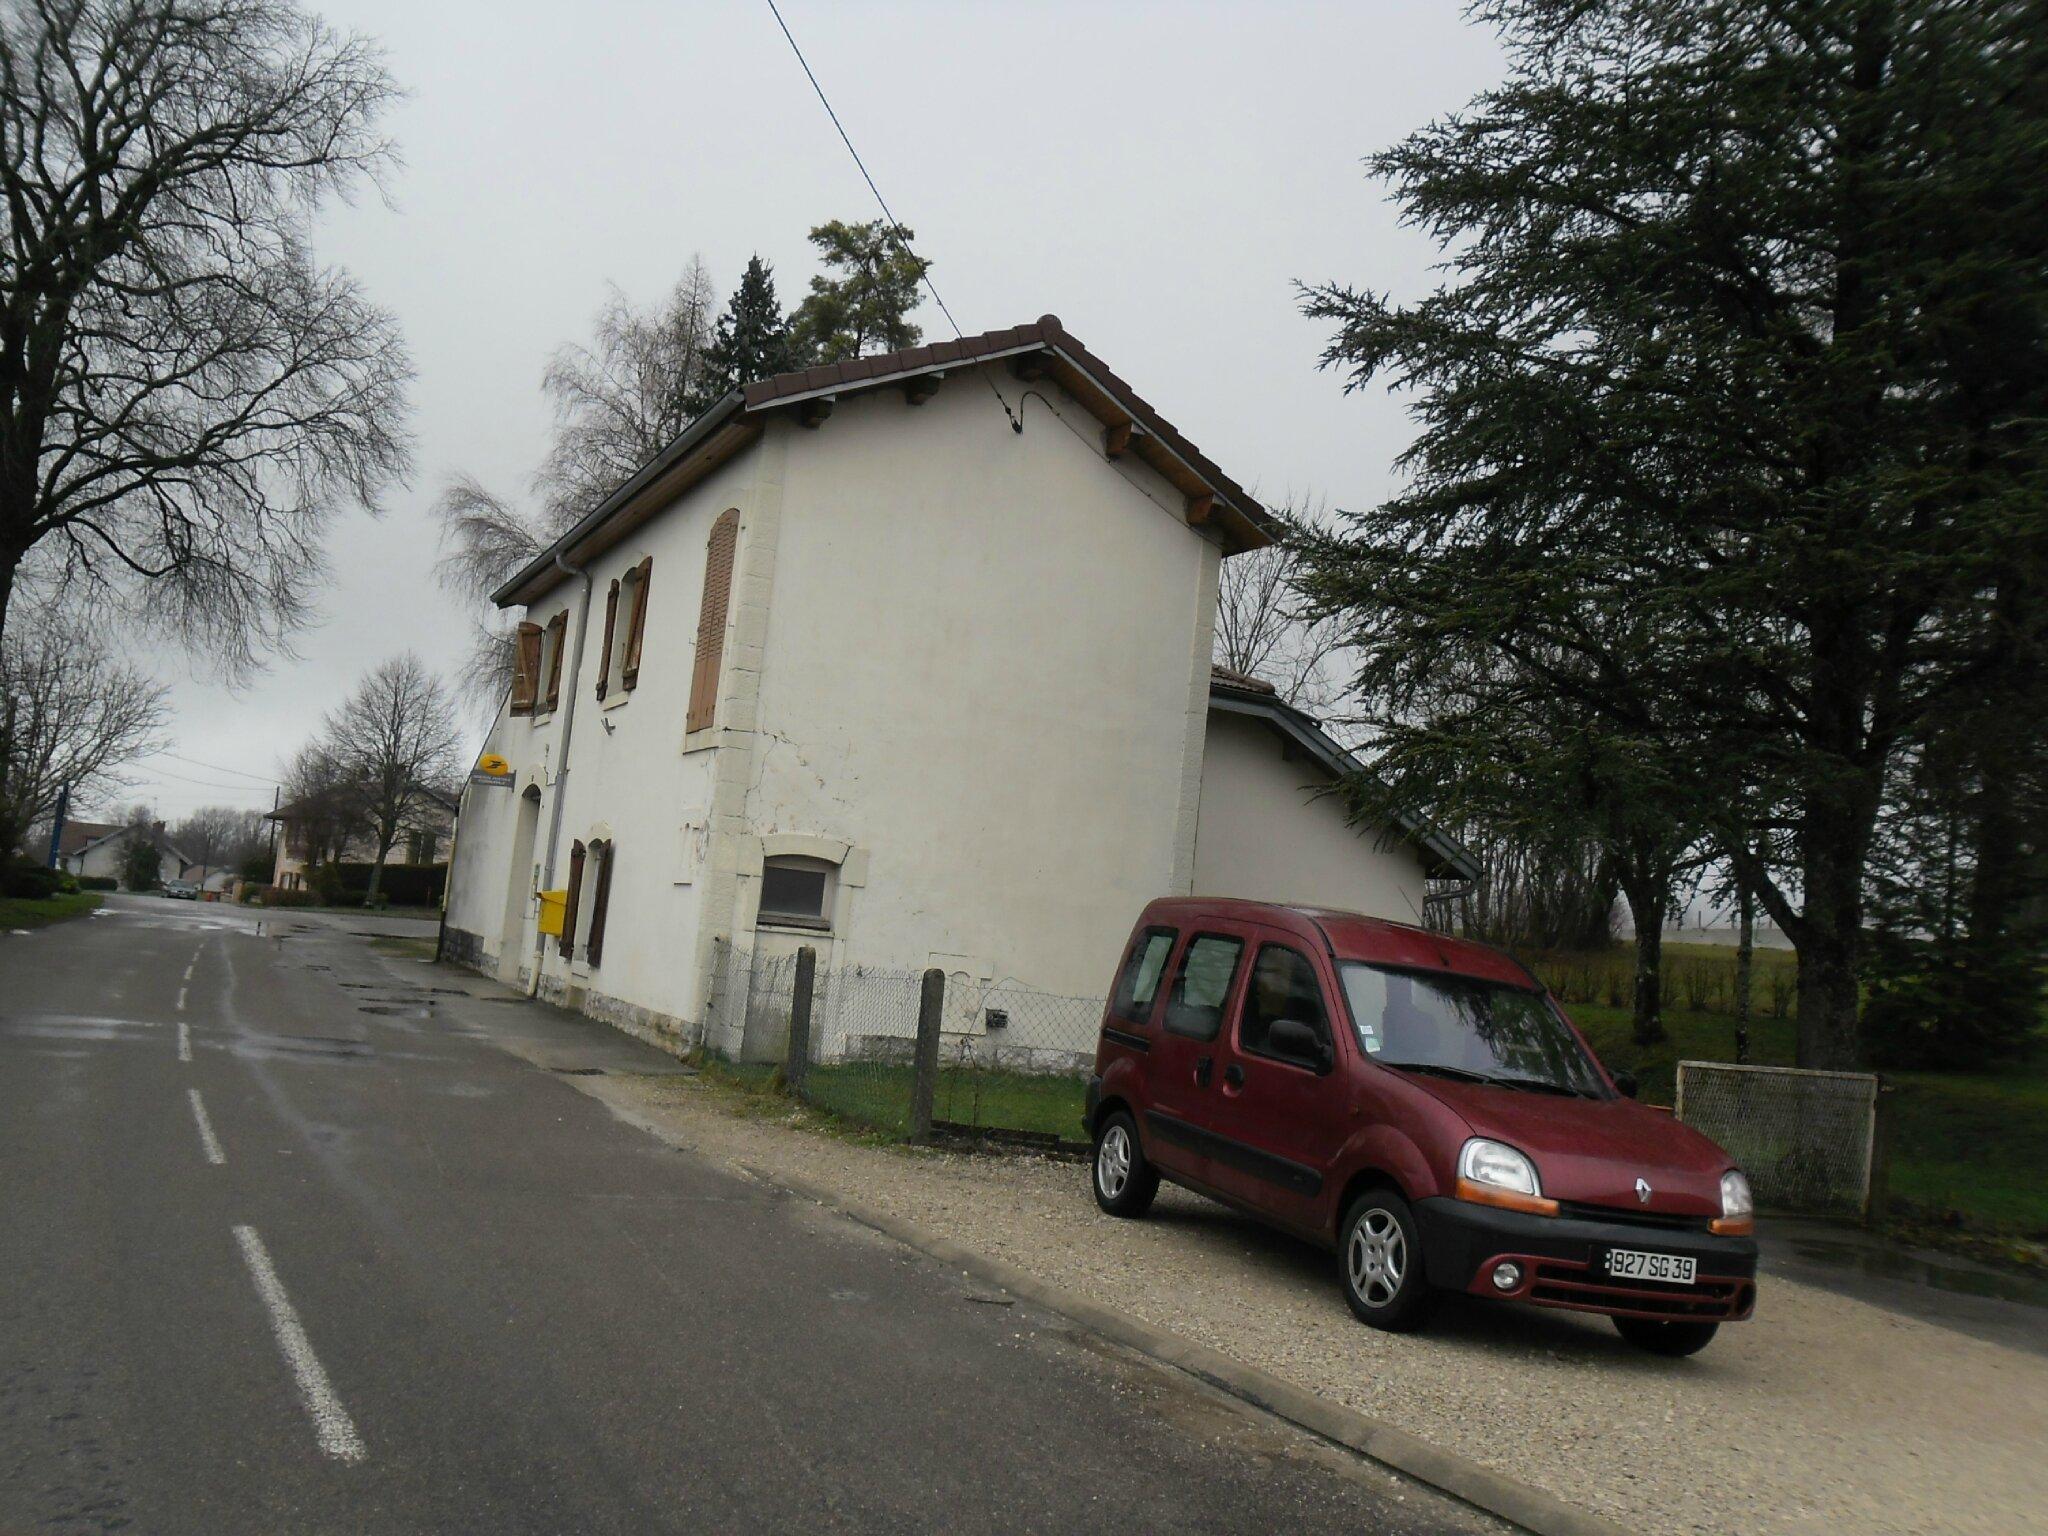 Charchilla (Jura)